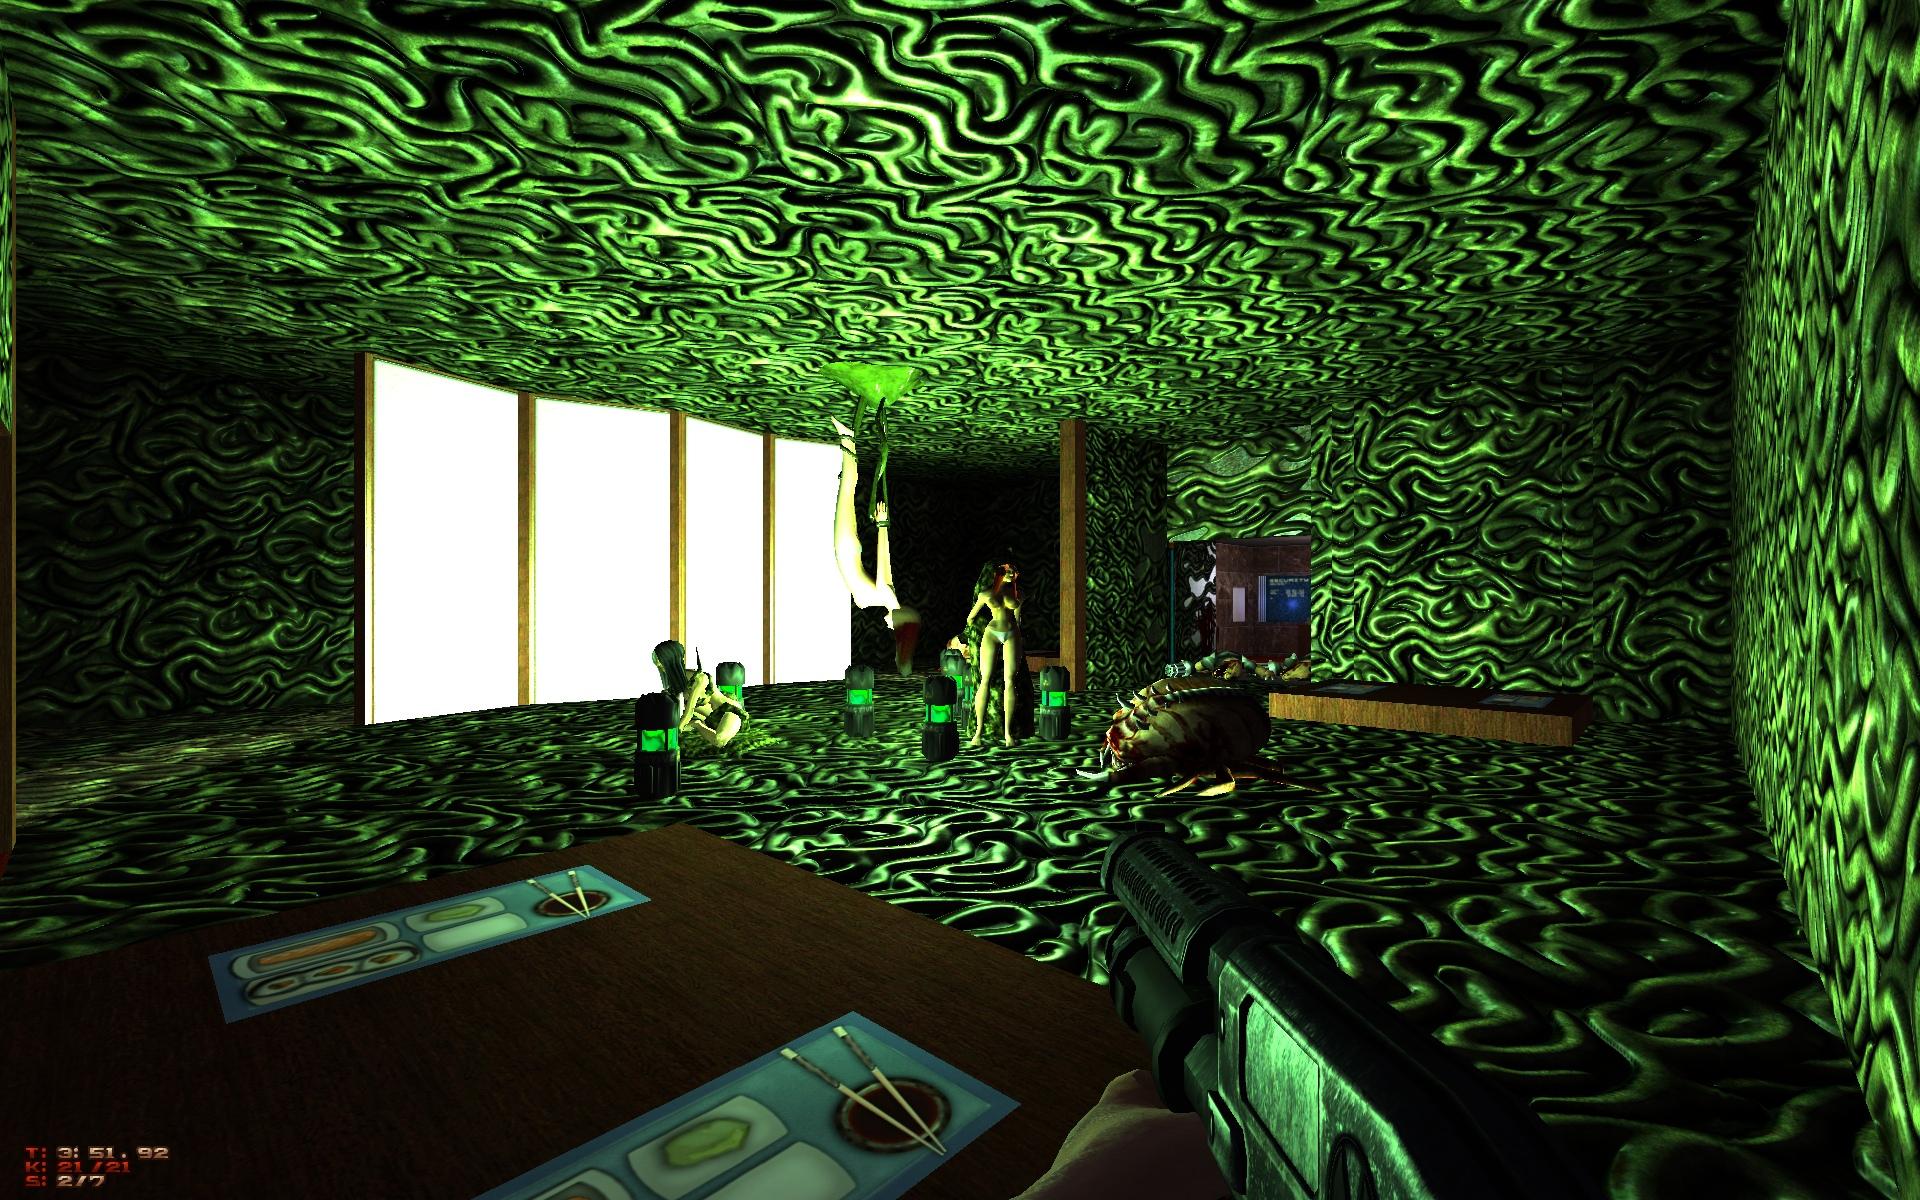 Fallout bet at home live stream fullscreen bet at home Poker Szybkość pracy bet at home freeroll 3 Megaton House Themes